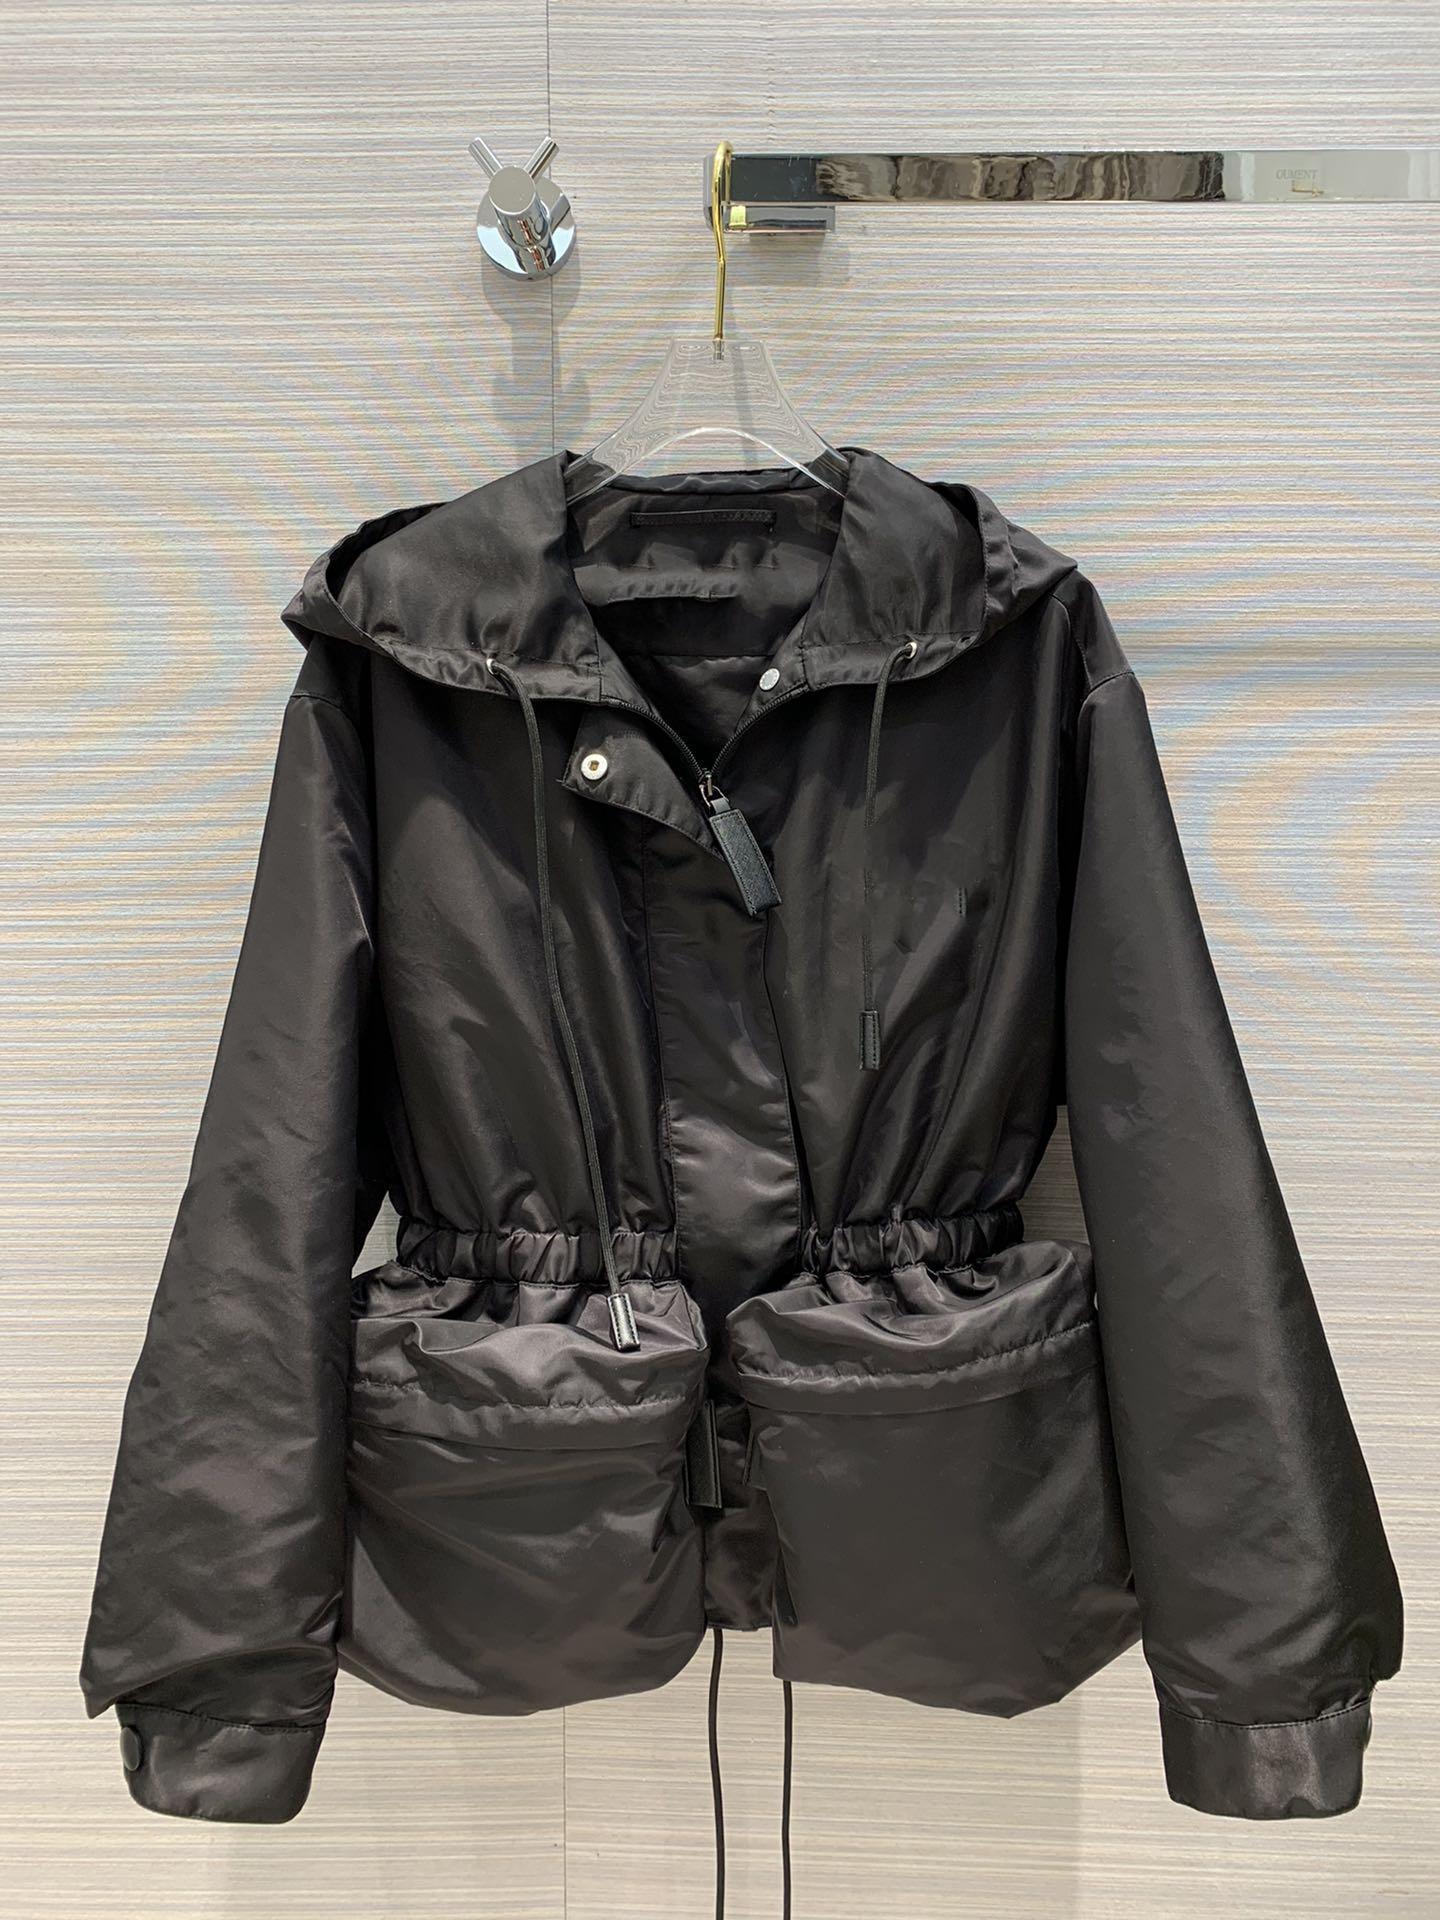 Milan Runway Coats 2020 Hooded Long Sleeve Women's Coats Designer Coats Brand Same Style Jackets 0919-2